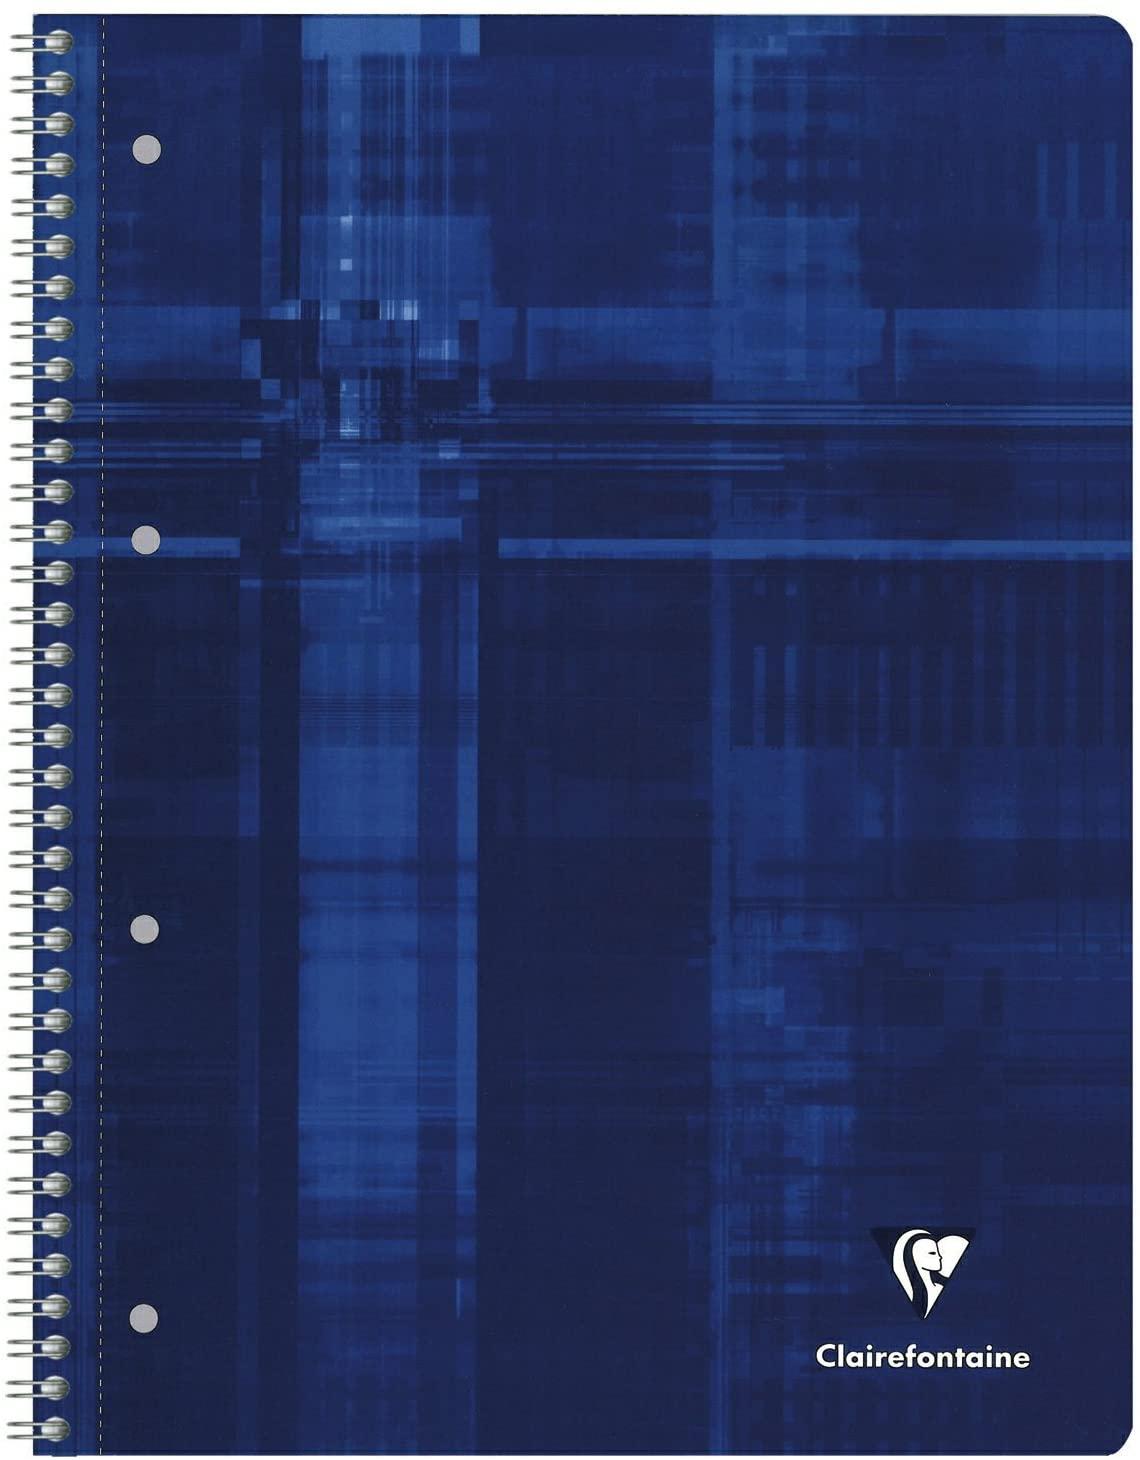 Clairefontaine 8252C Collegeblock (Kariert Lineatur 22, DIN A4, 21 x 29,7 cm, 80 Blatt) 1 Stück zufä